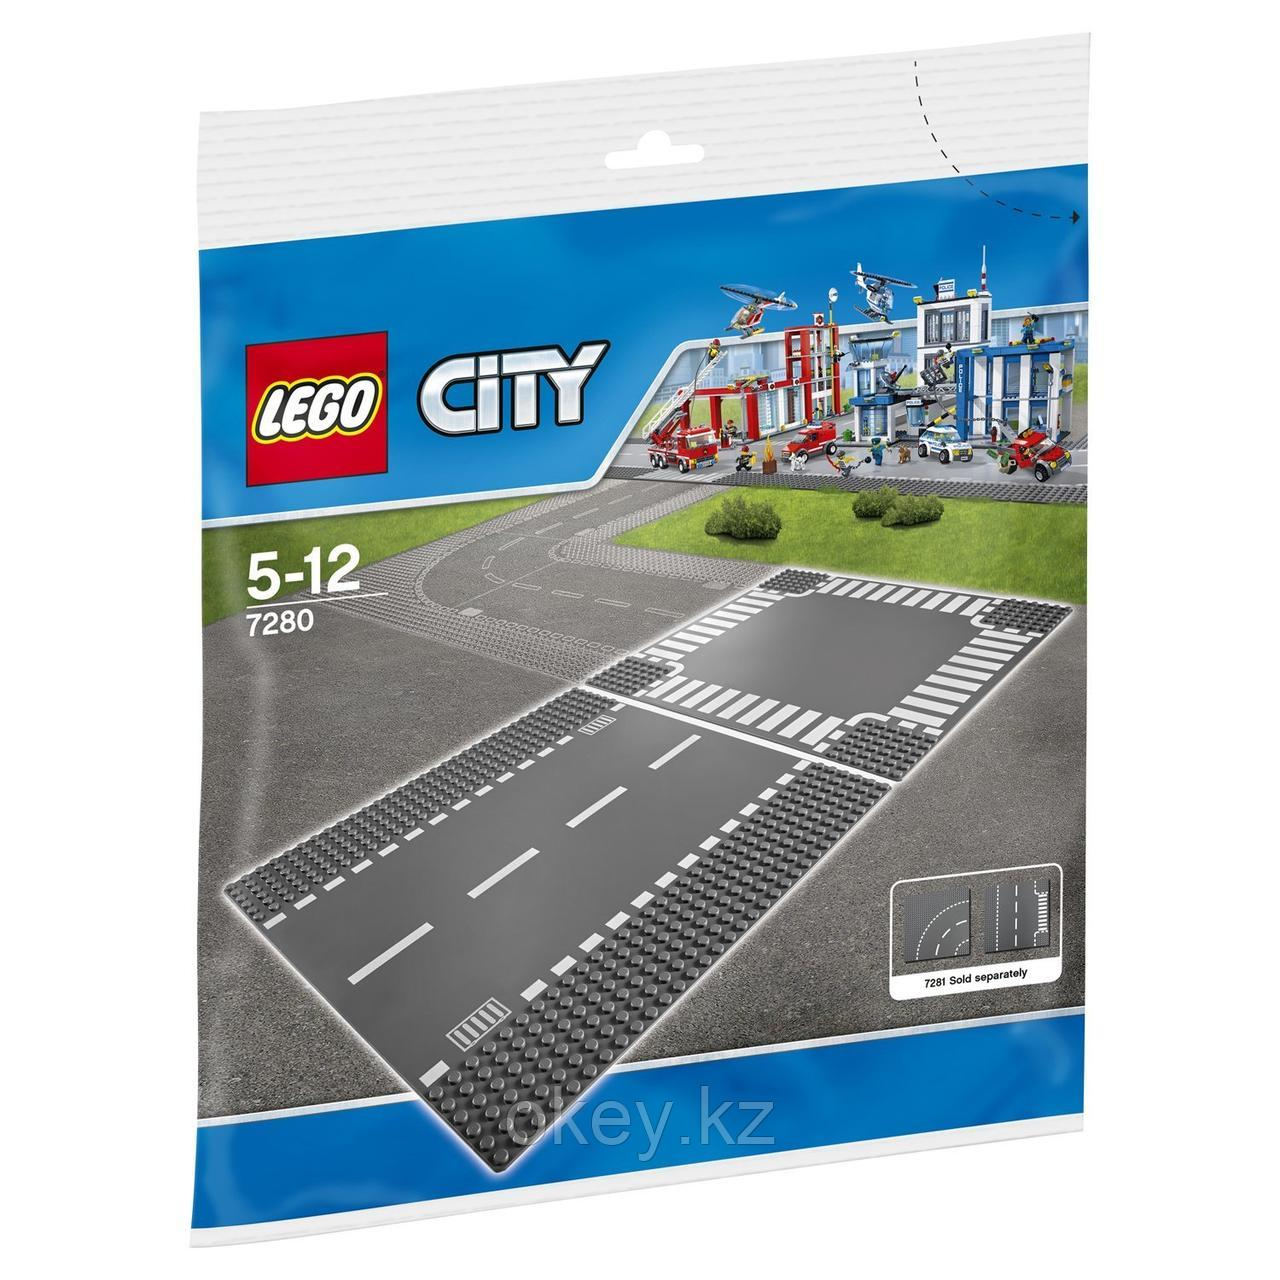 LEGO City: Дорога и перекрёсток 7280